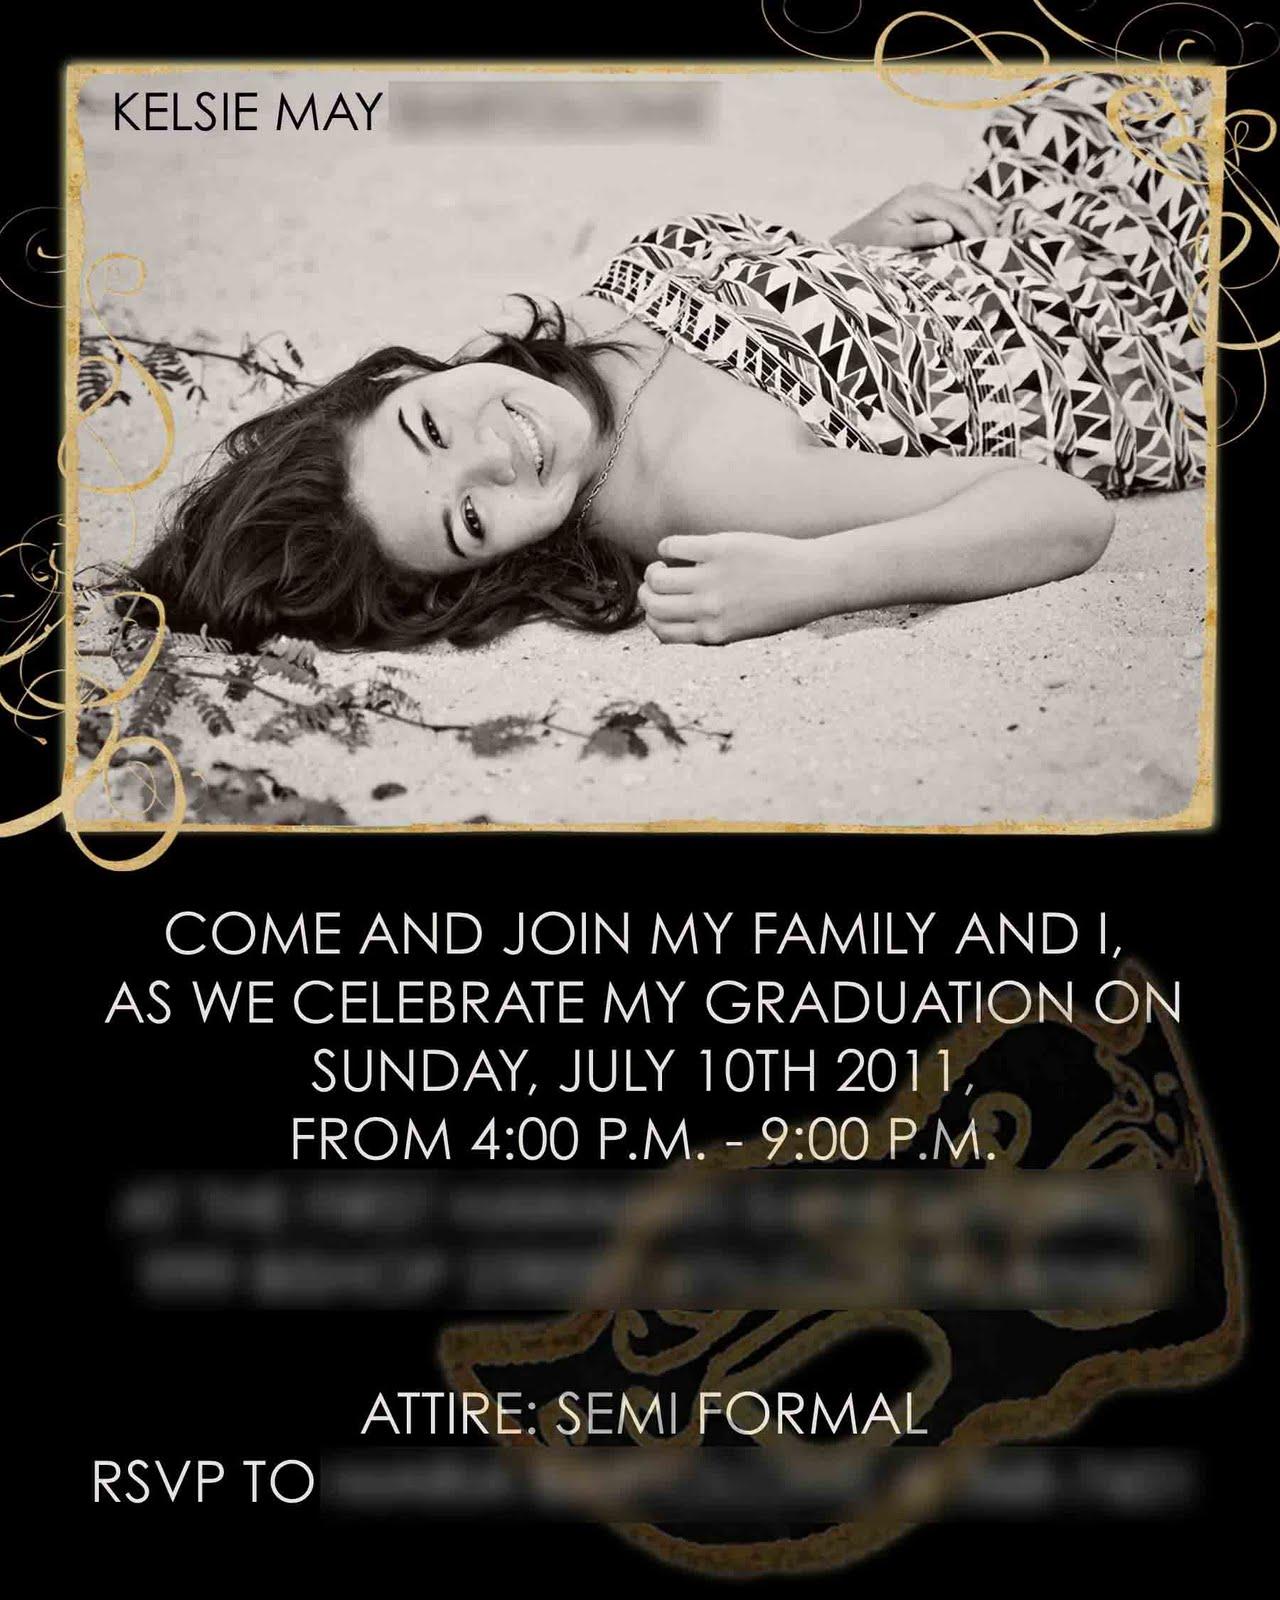 Paixão Designs: Graduation Party Invitation